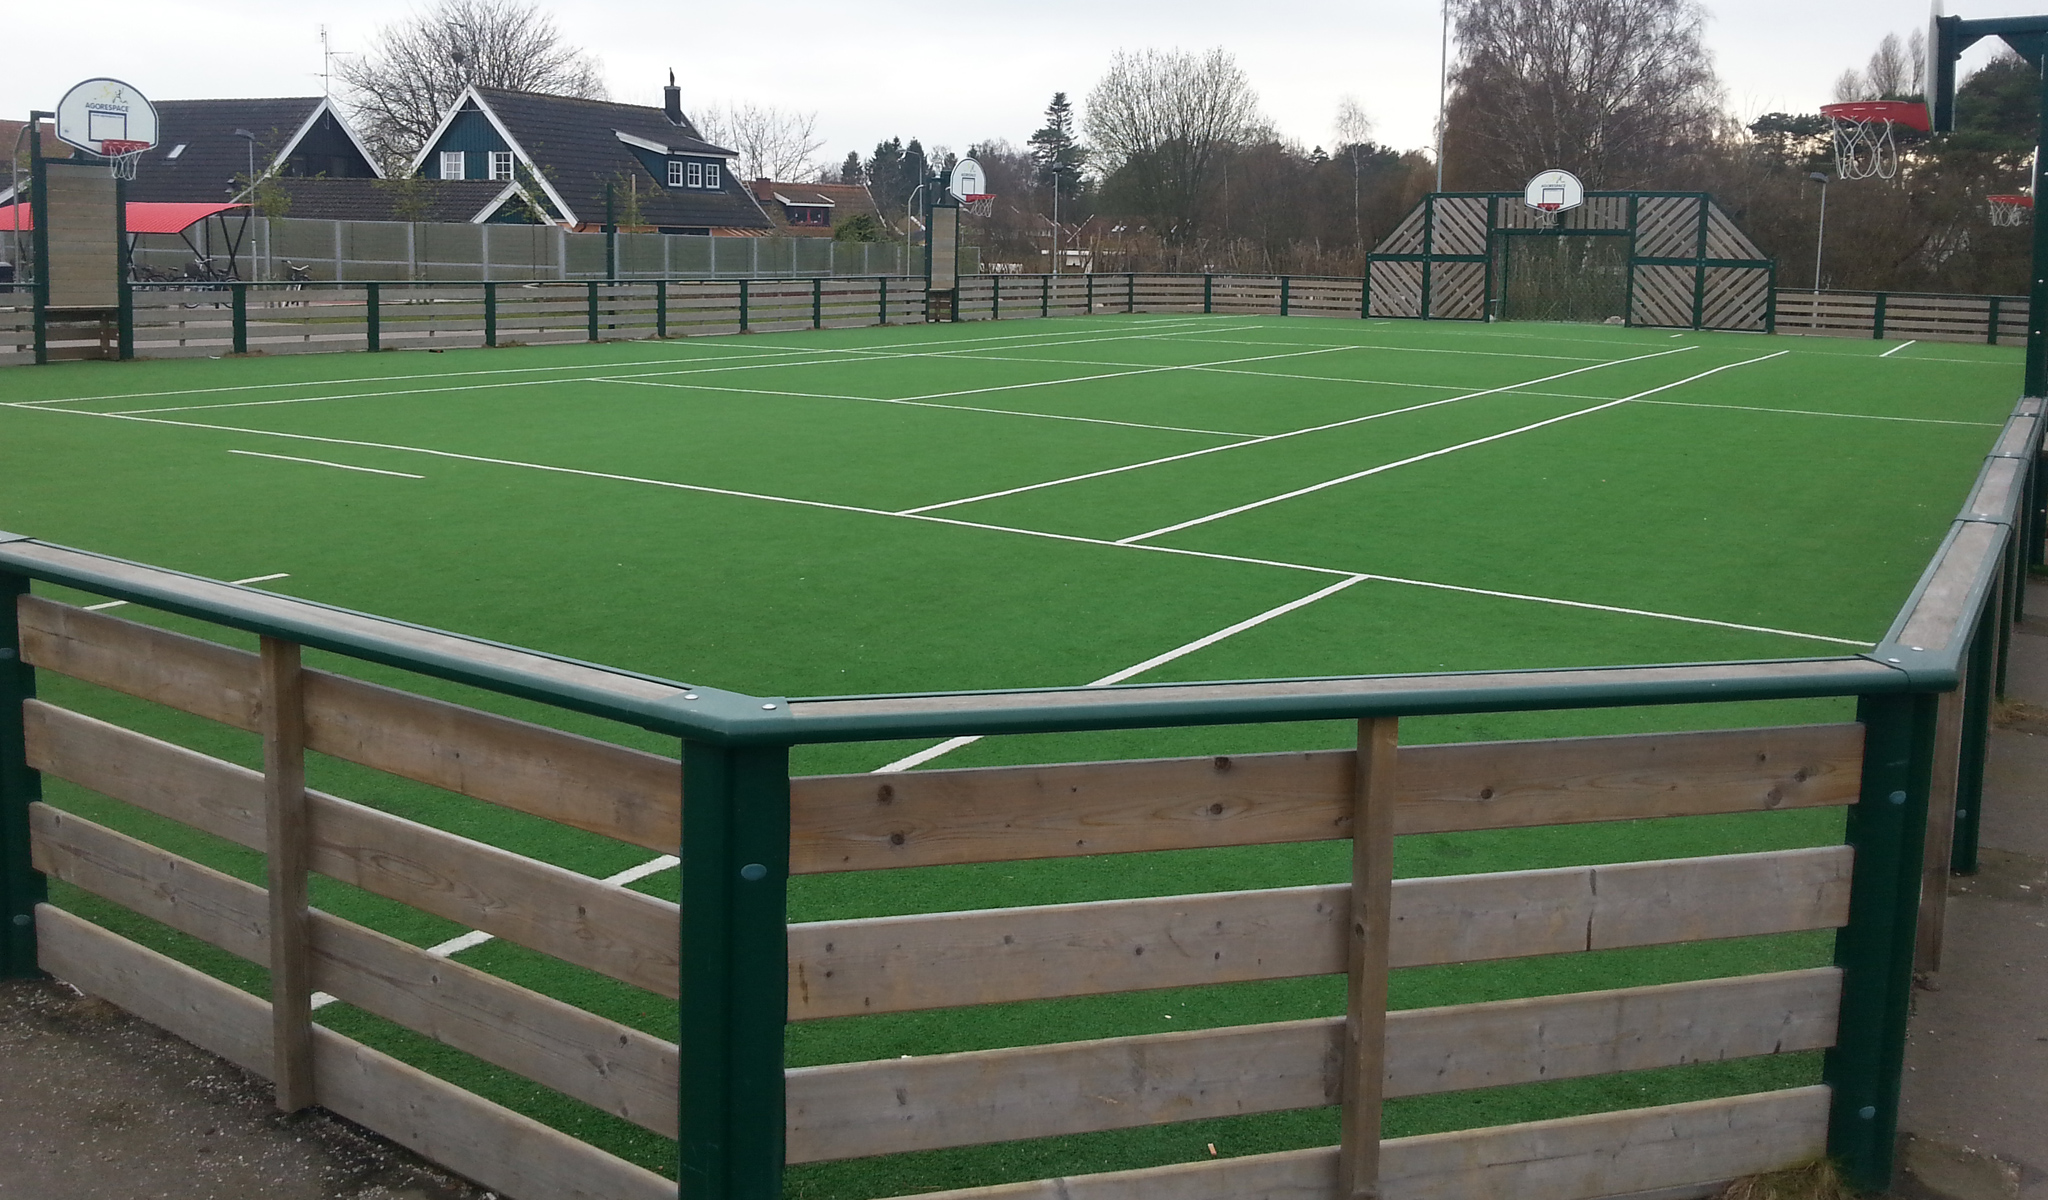 Agorespace multiarena näridrottsplats trä höllviken från unisport